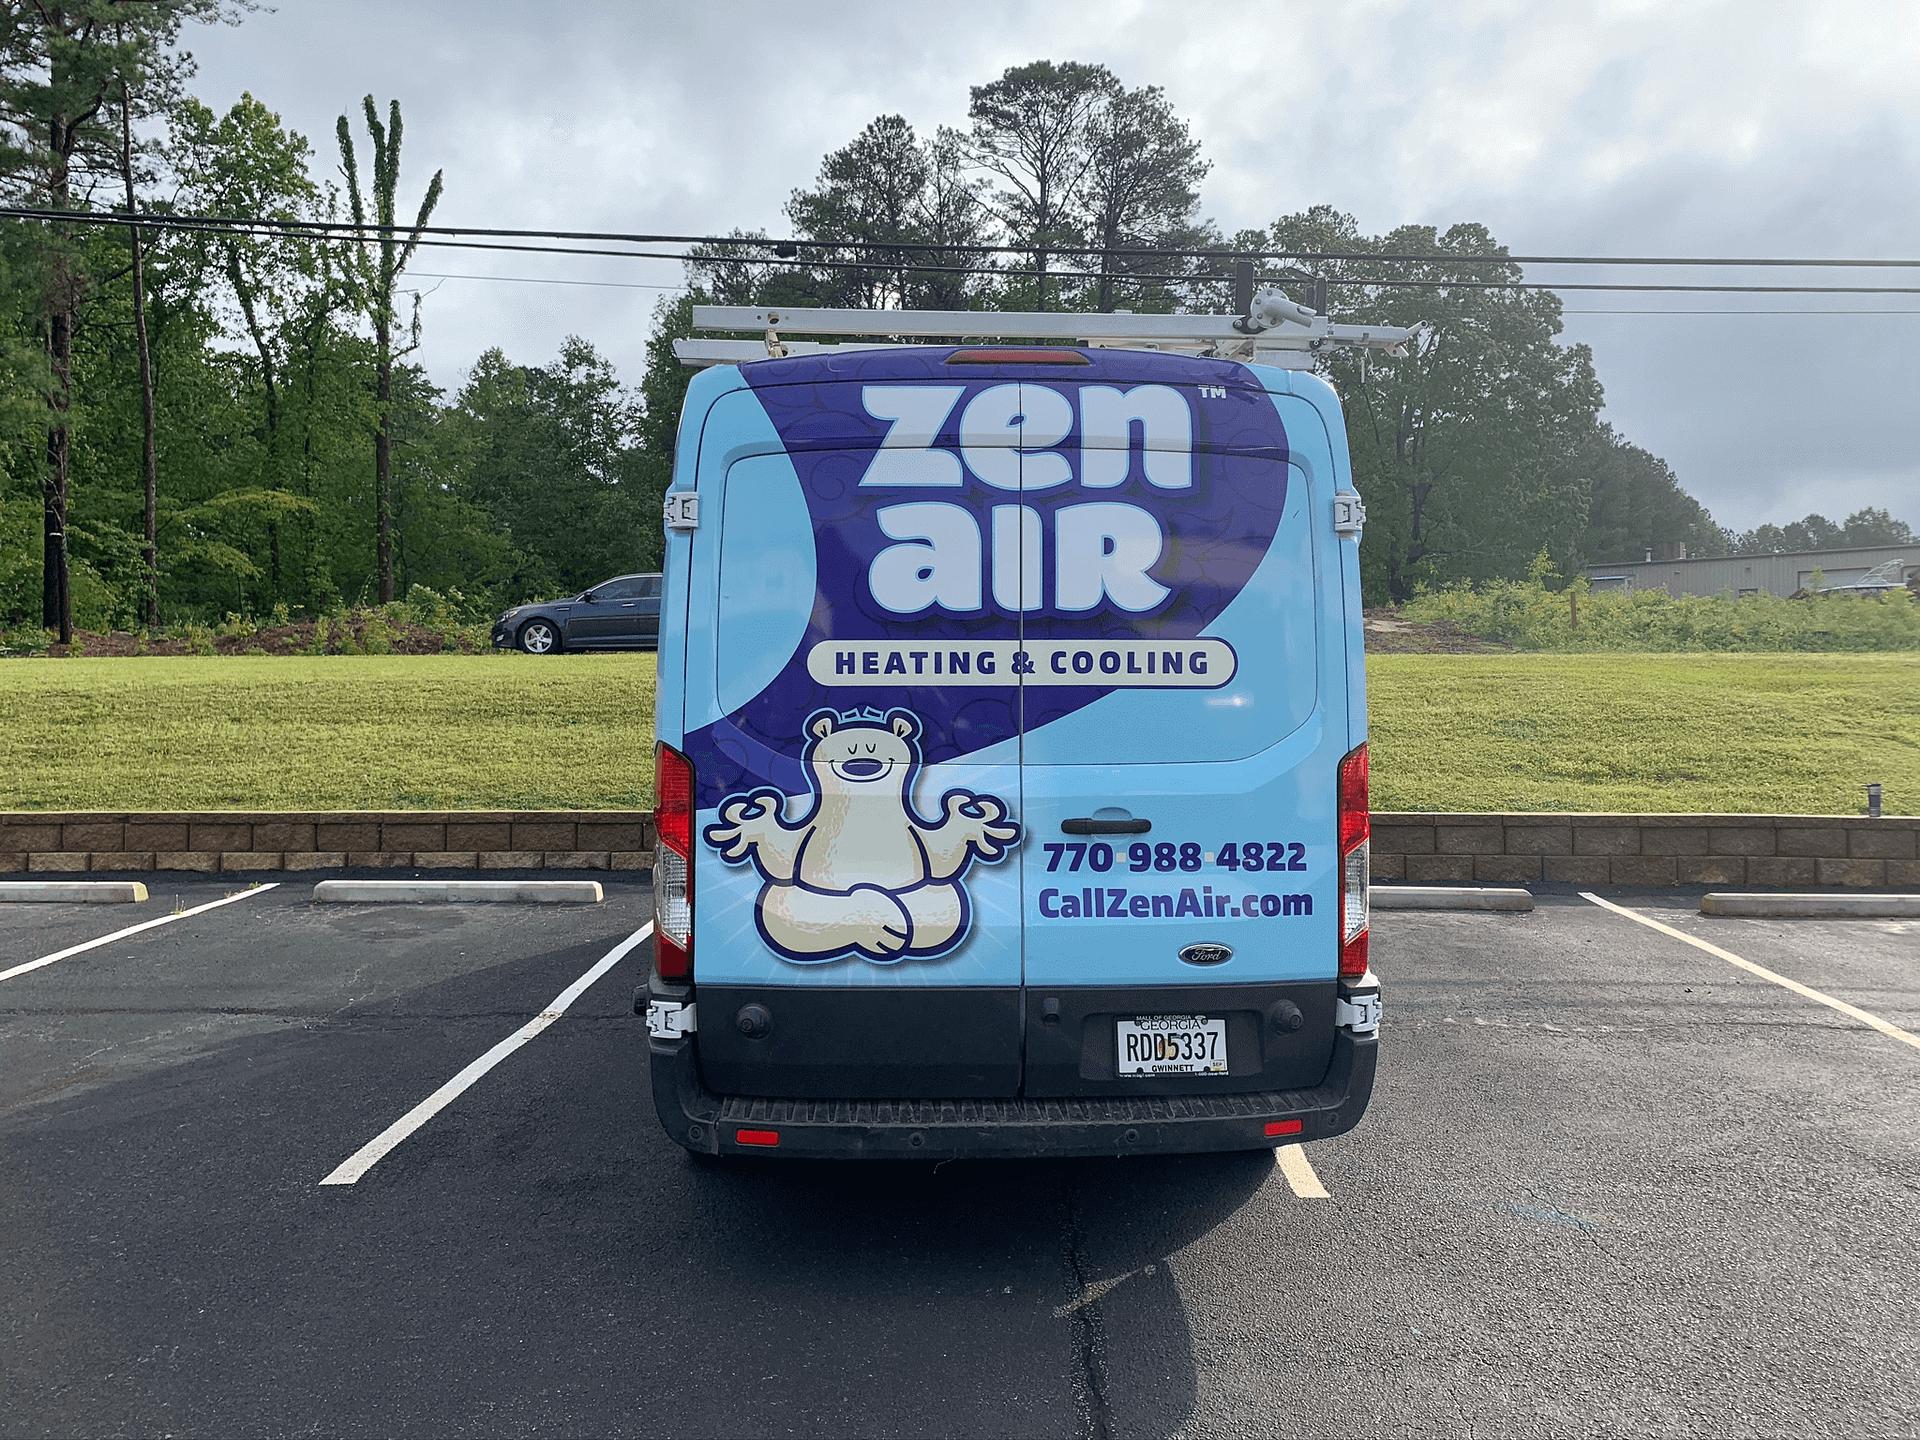 HVAC company van